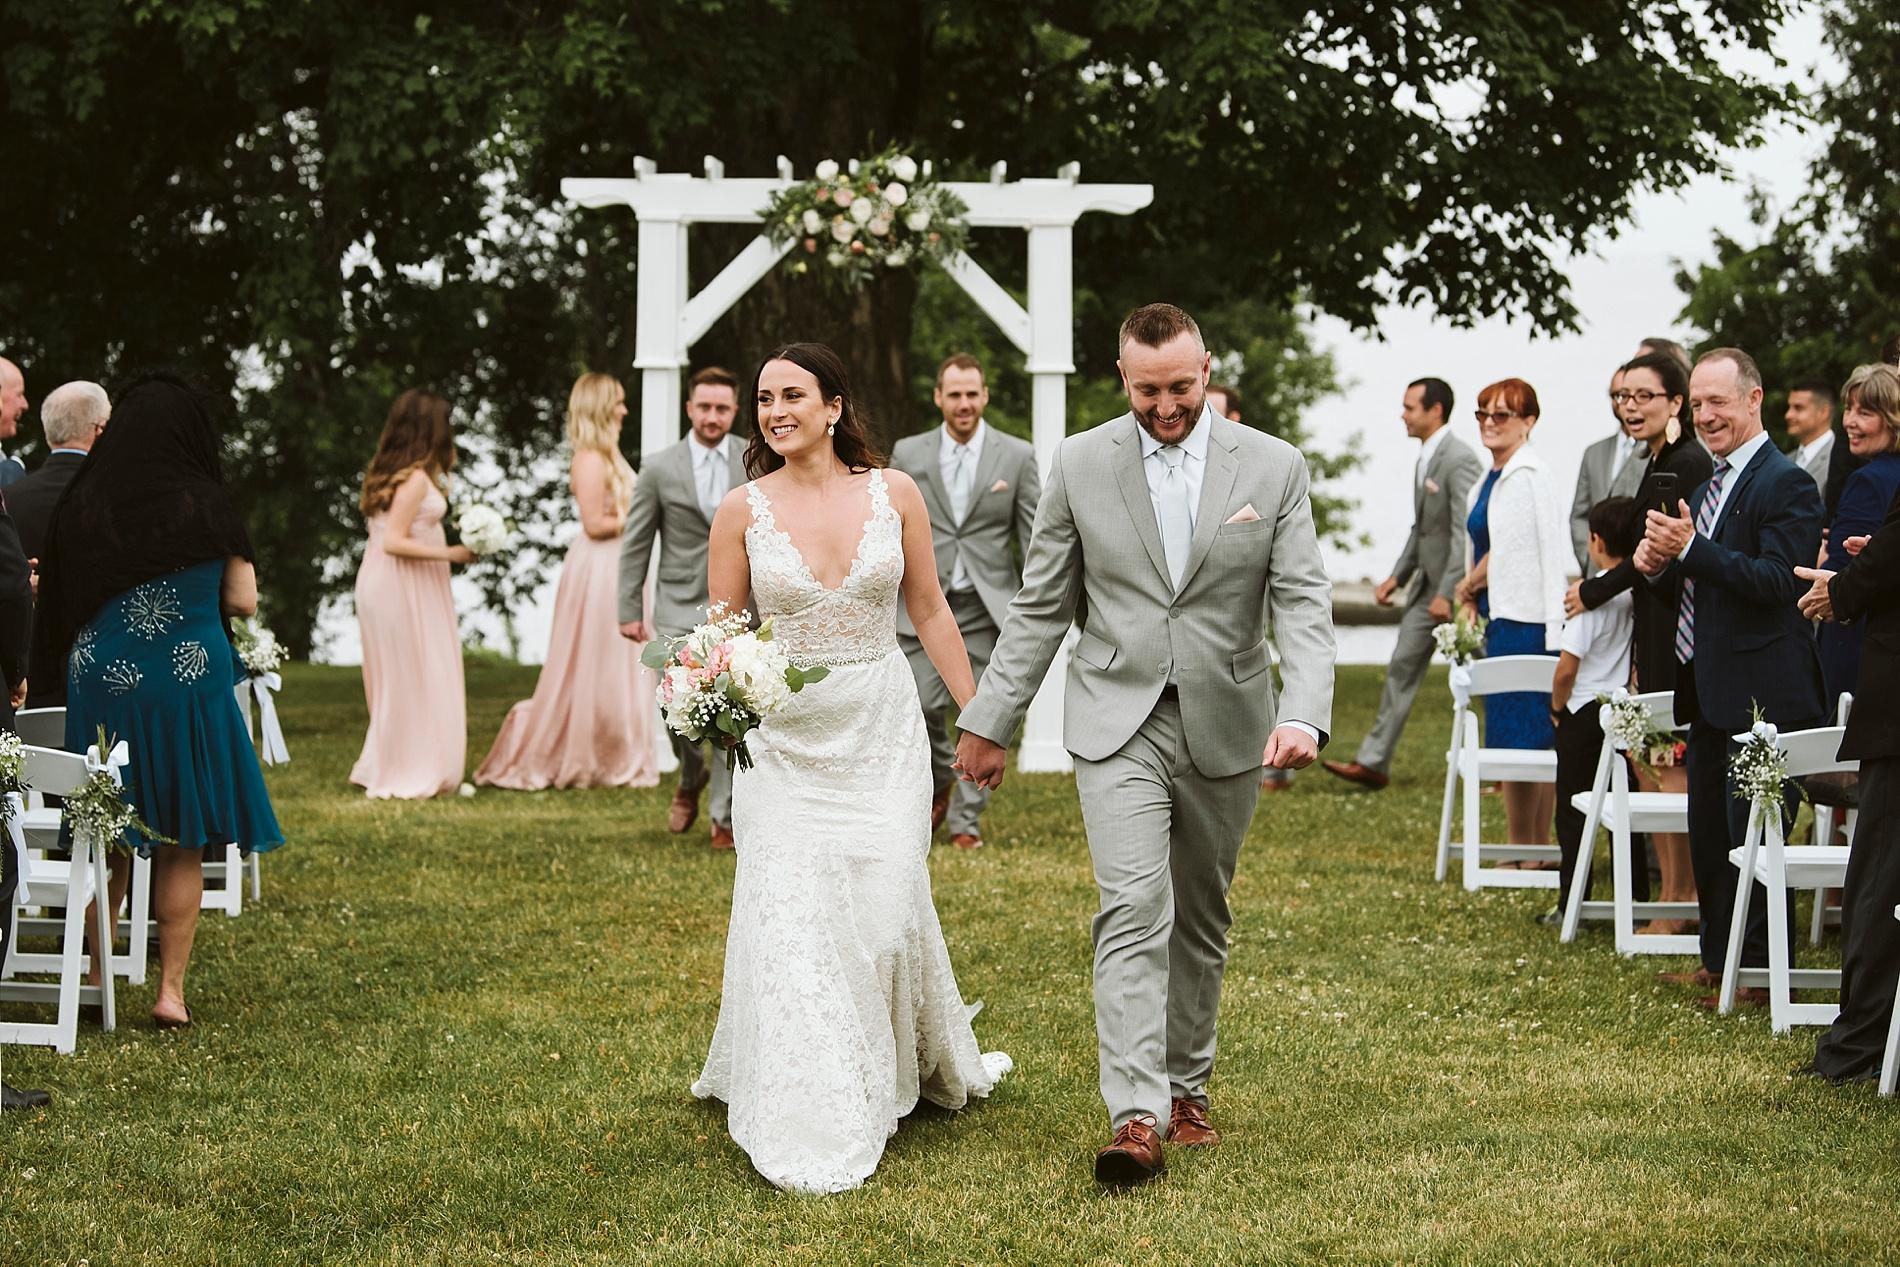 Kawartha_Lakes_Wedding_Bobcageon_Eganridge_Resort_Toronto_Photographer_0040.jpg